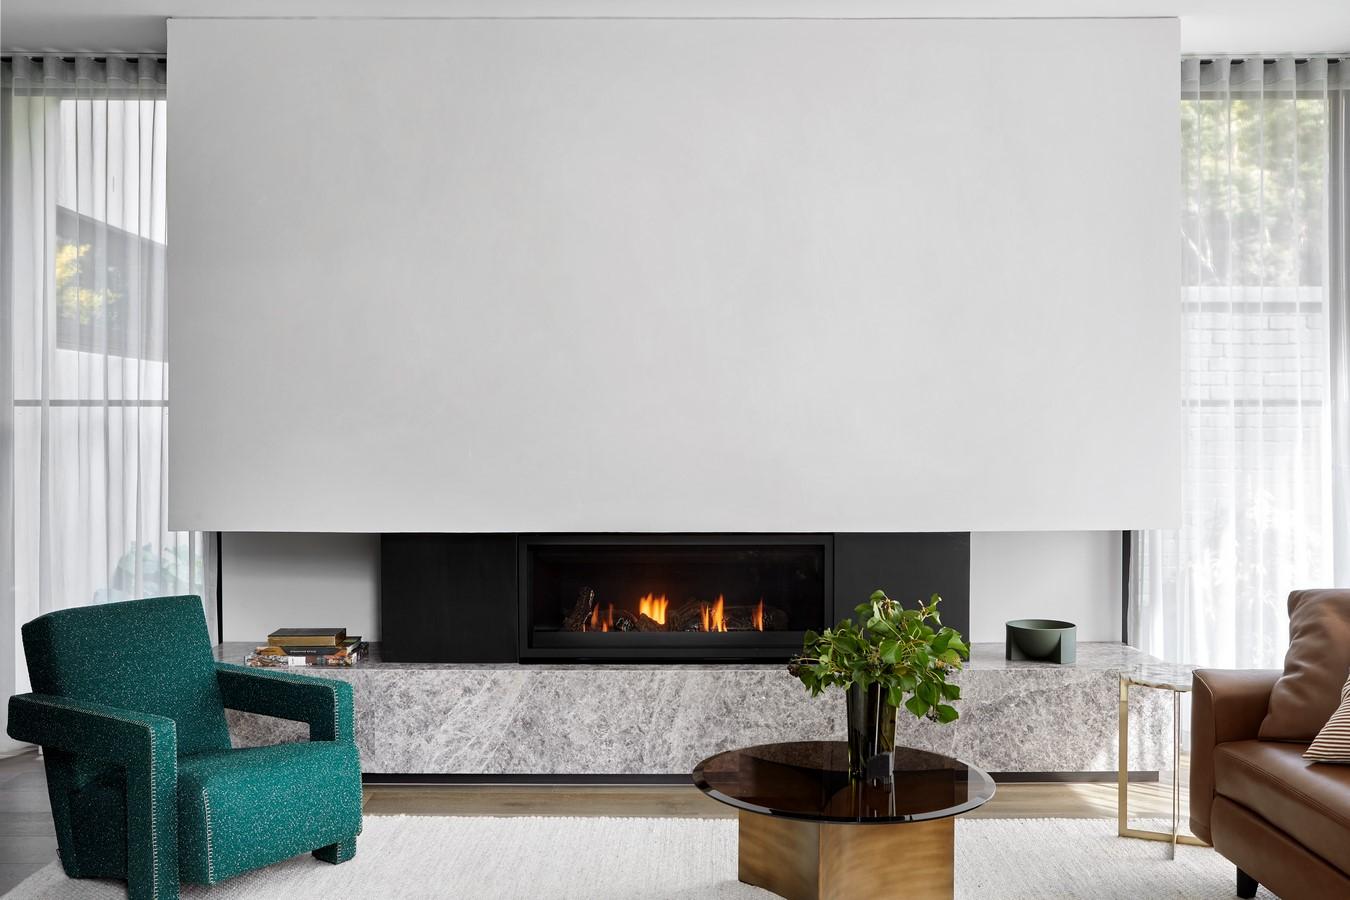 Elwood Residence by Bea & co - Sheet1